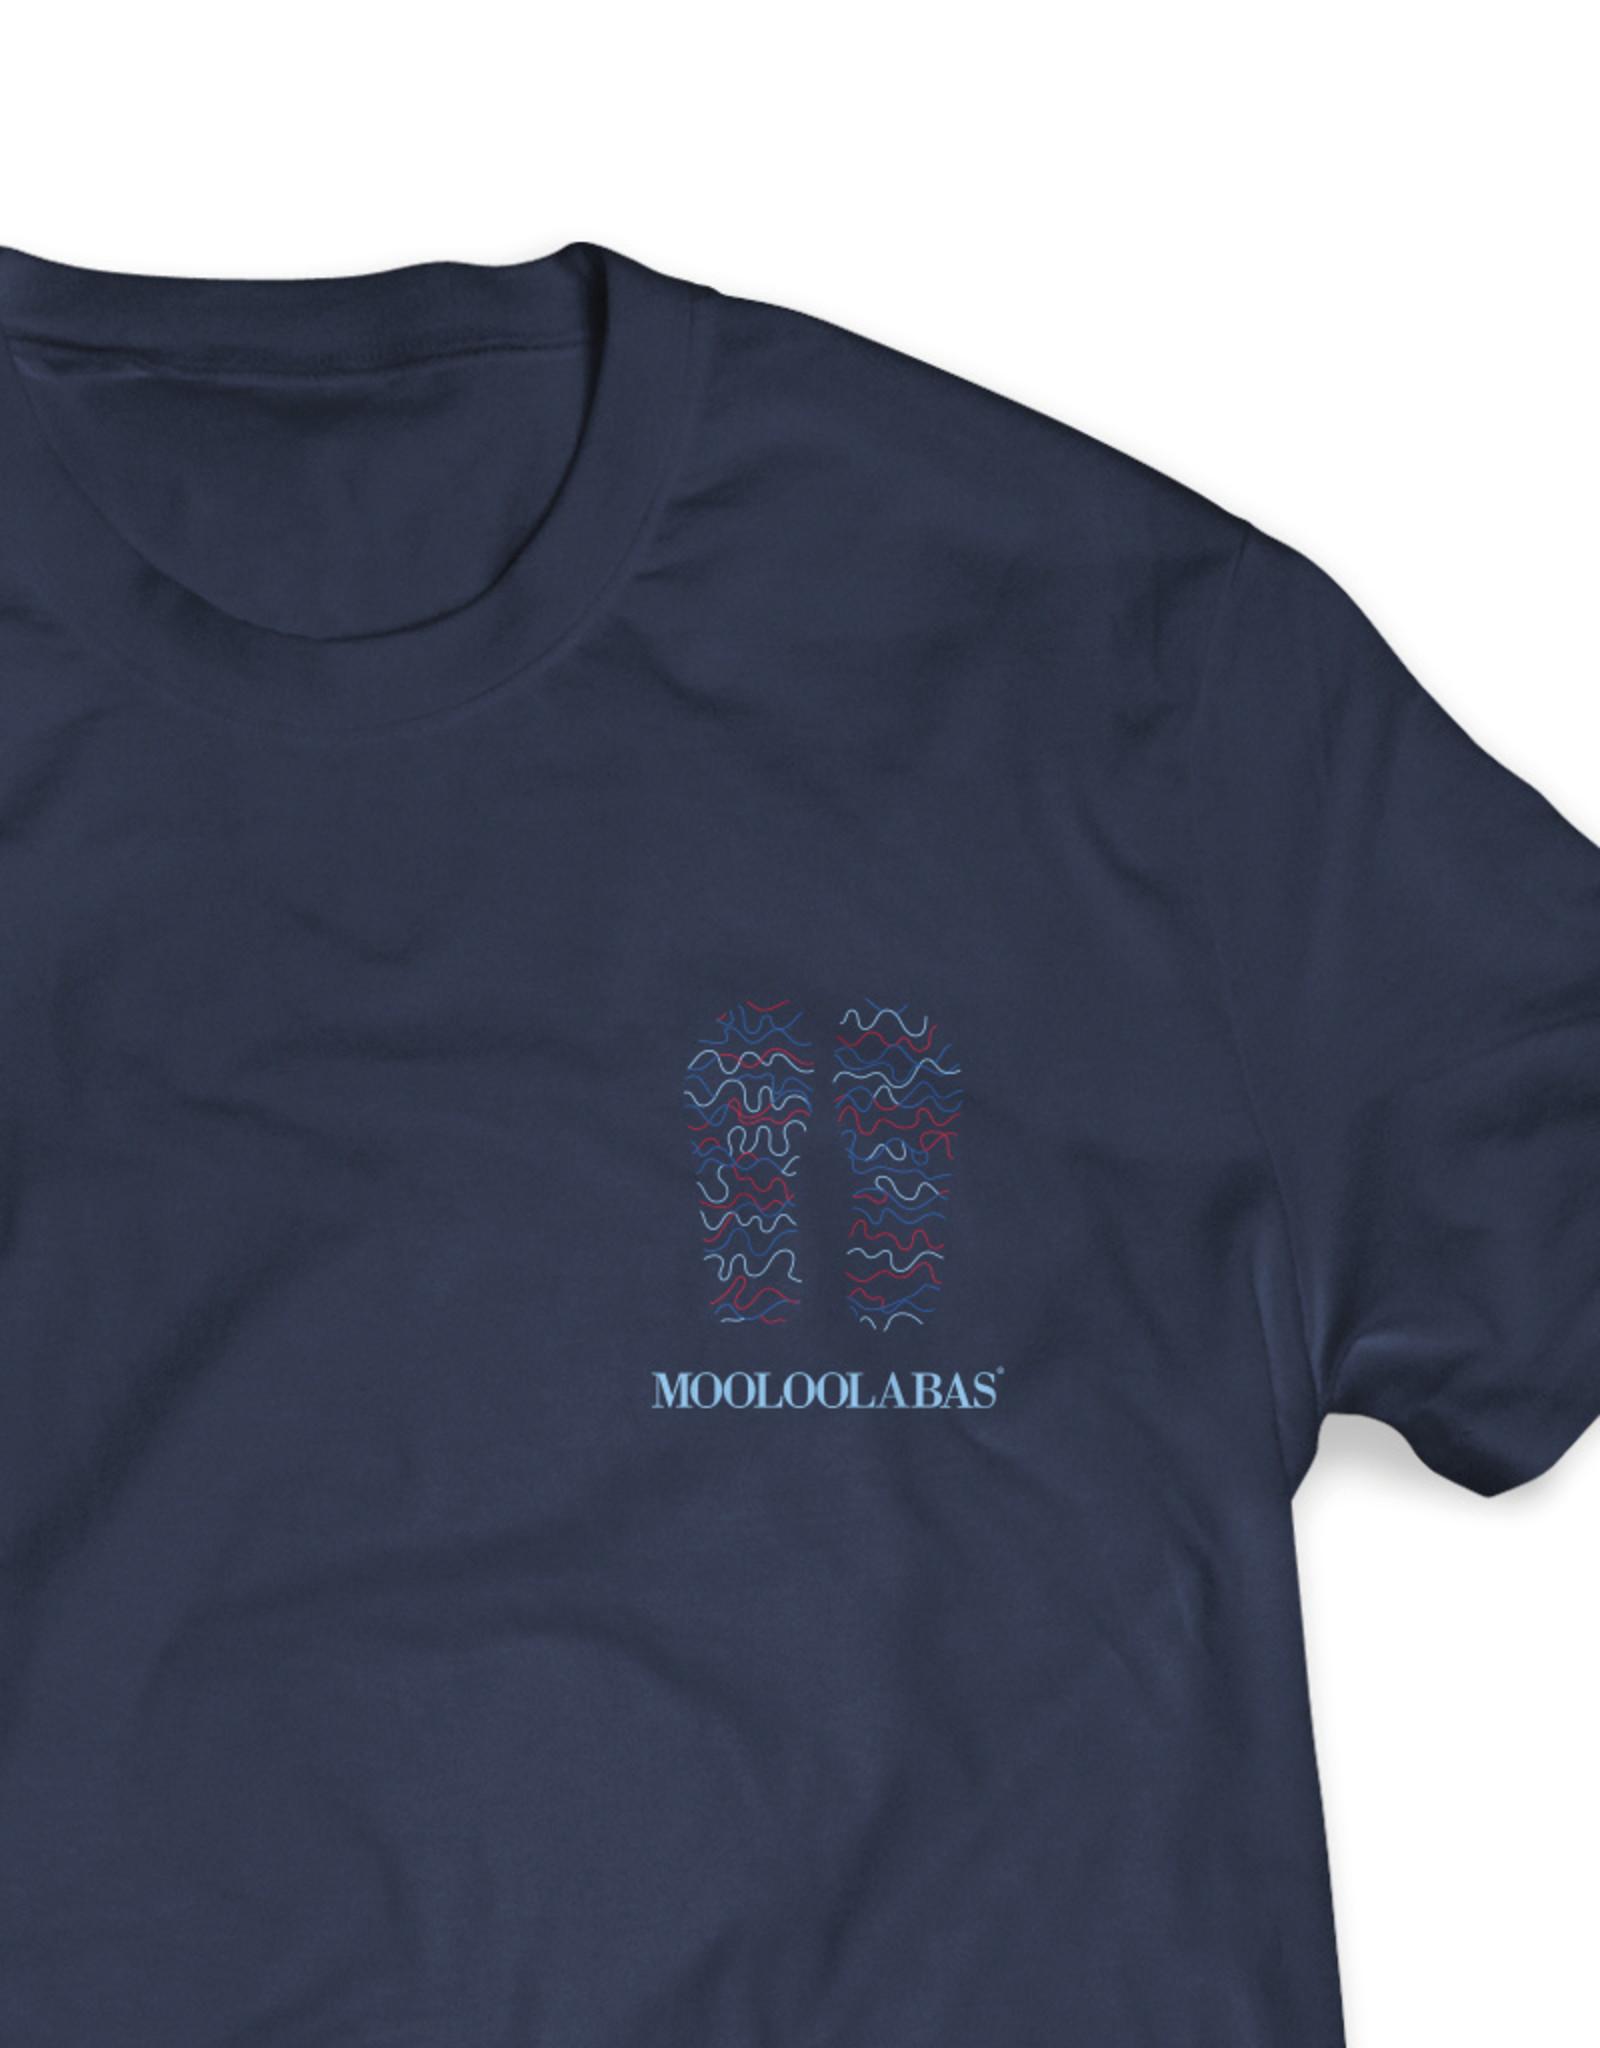 MOOLOOLABAS T-Shirt